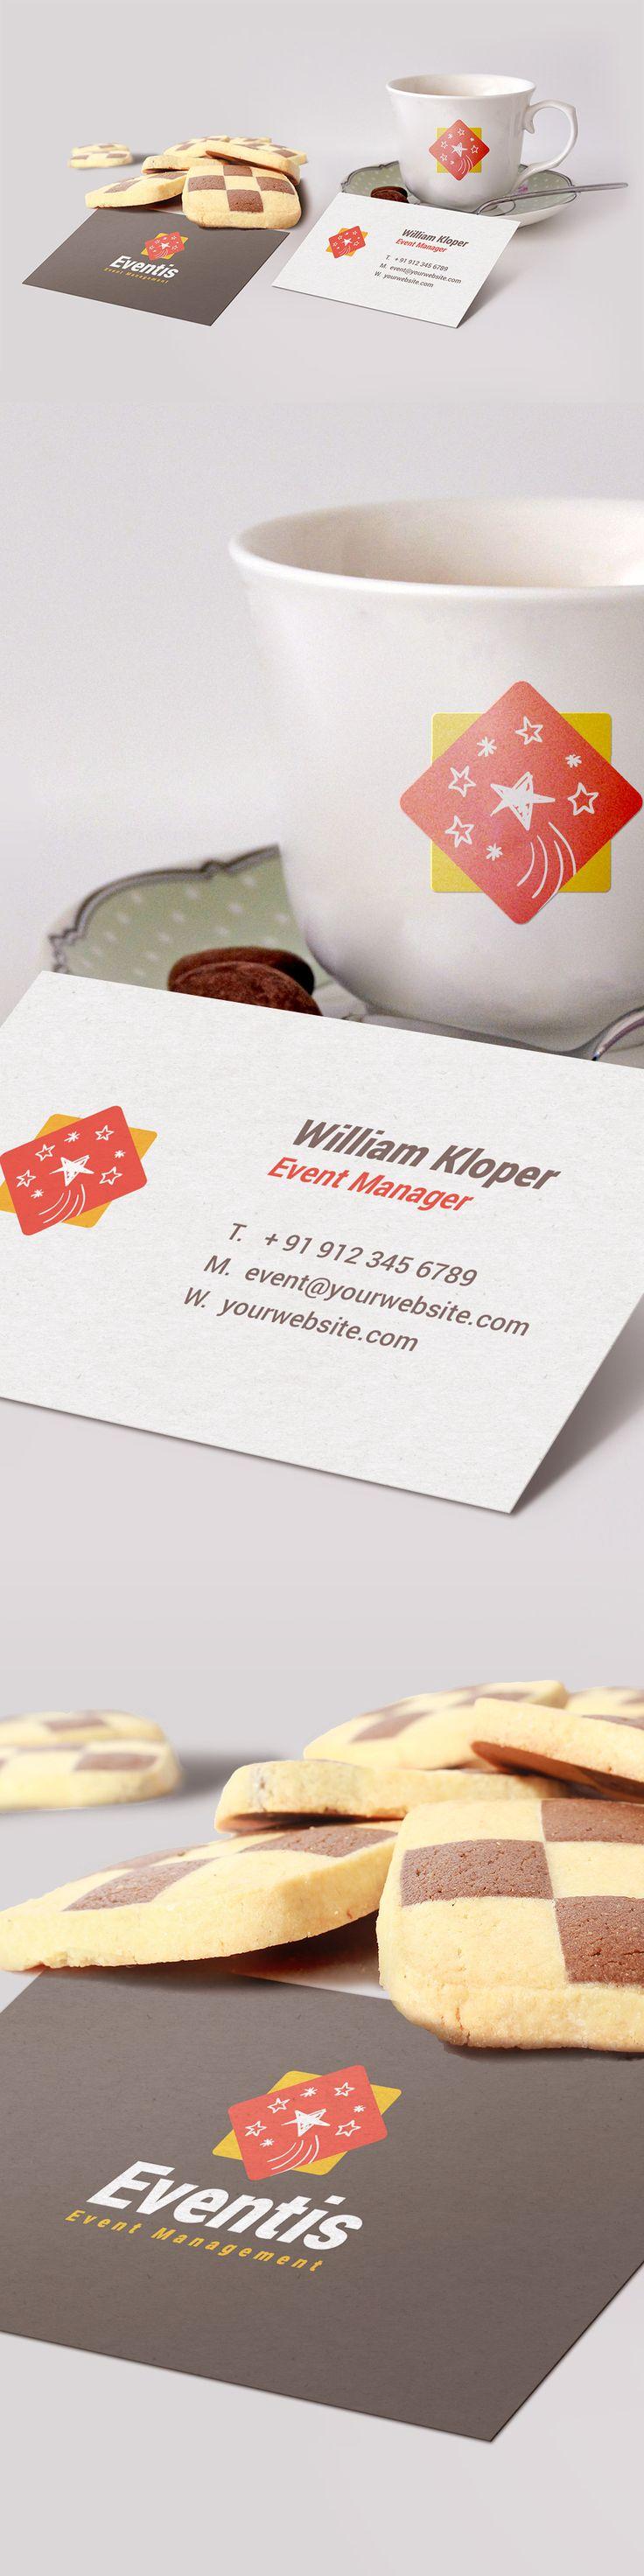 the 25 best free business card design ideas on pinterest